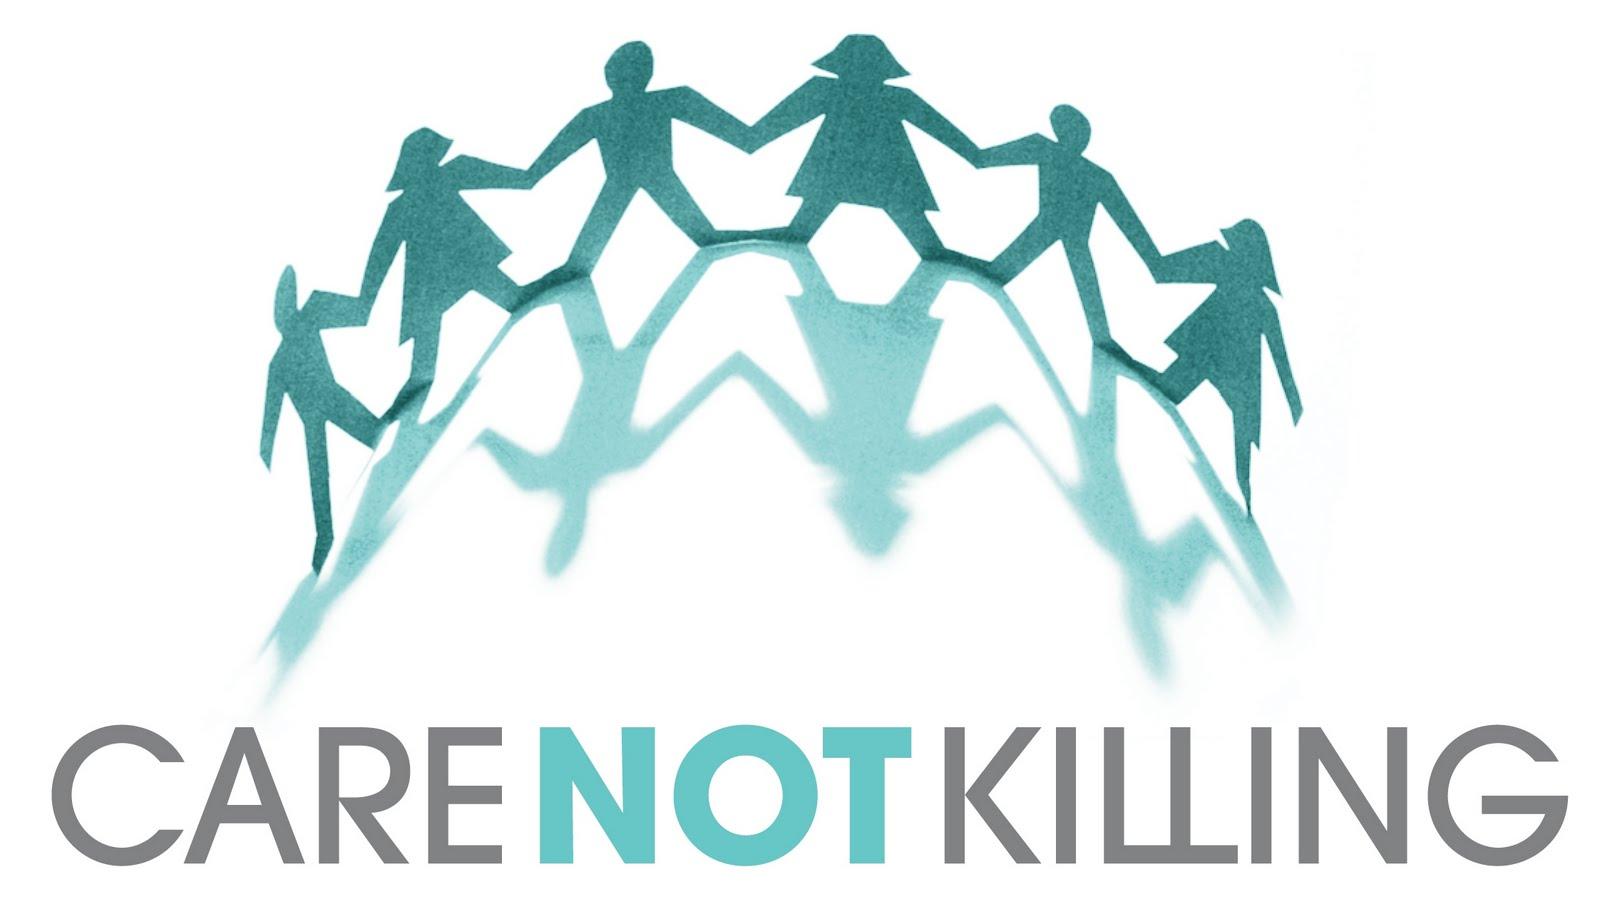 Pro-euthanasia arguments